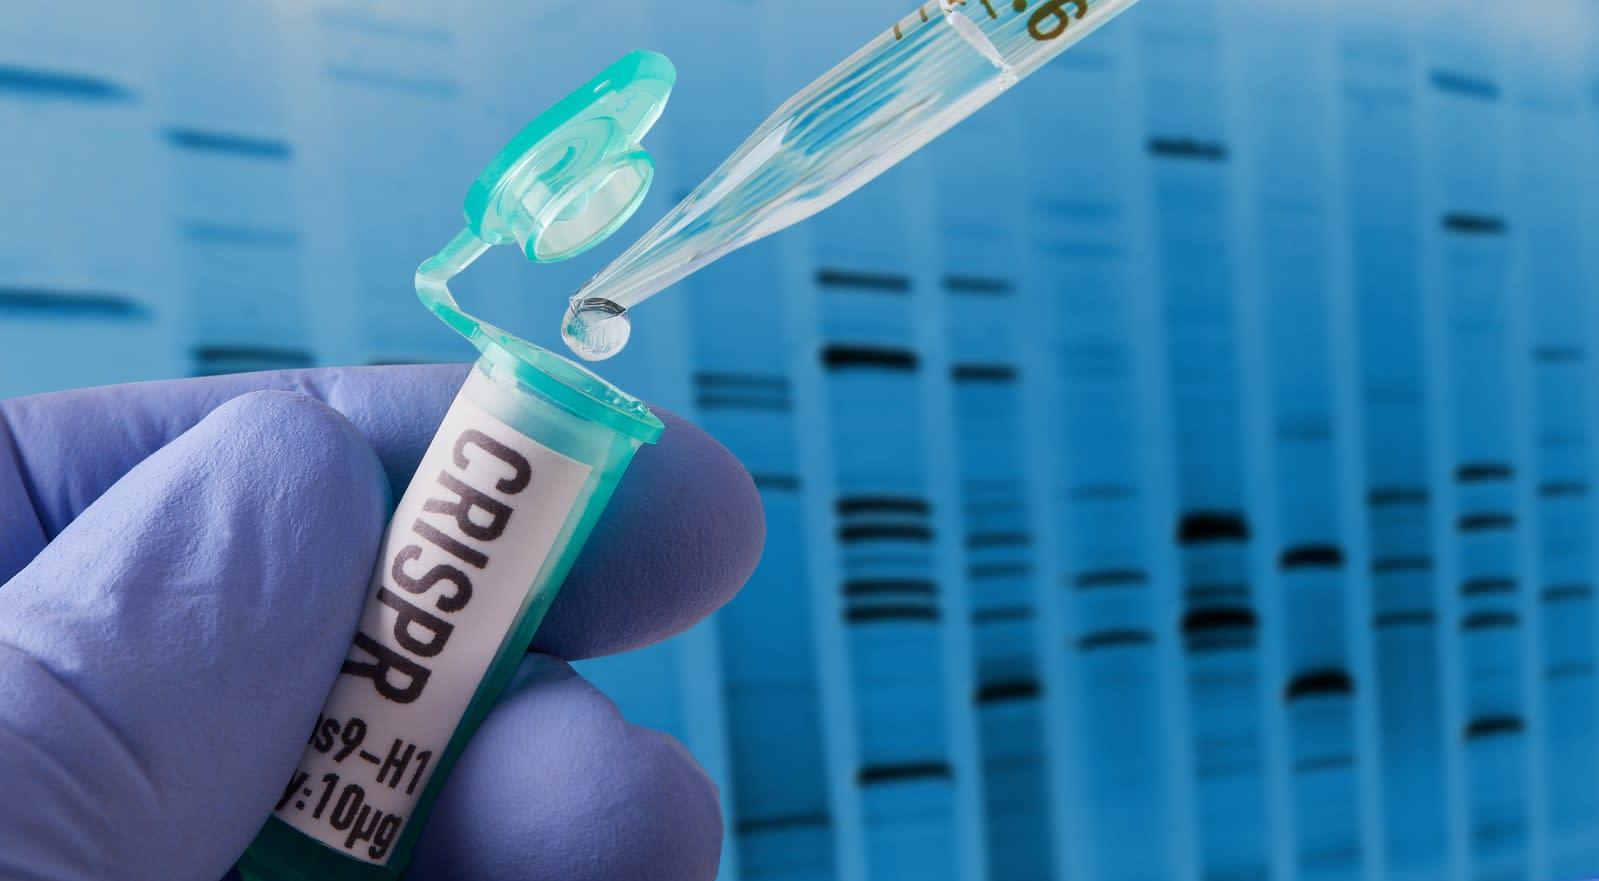 China's 2 CRISPR babies might have shorter life expectancies